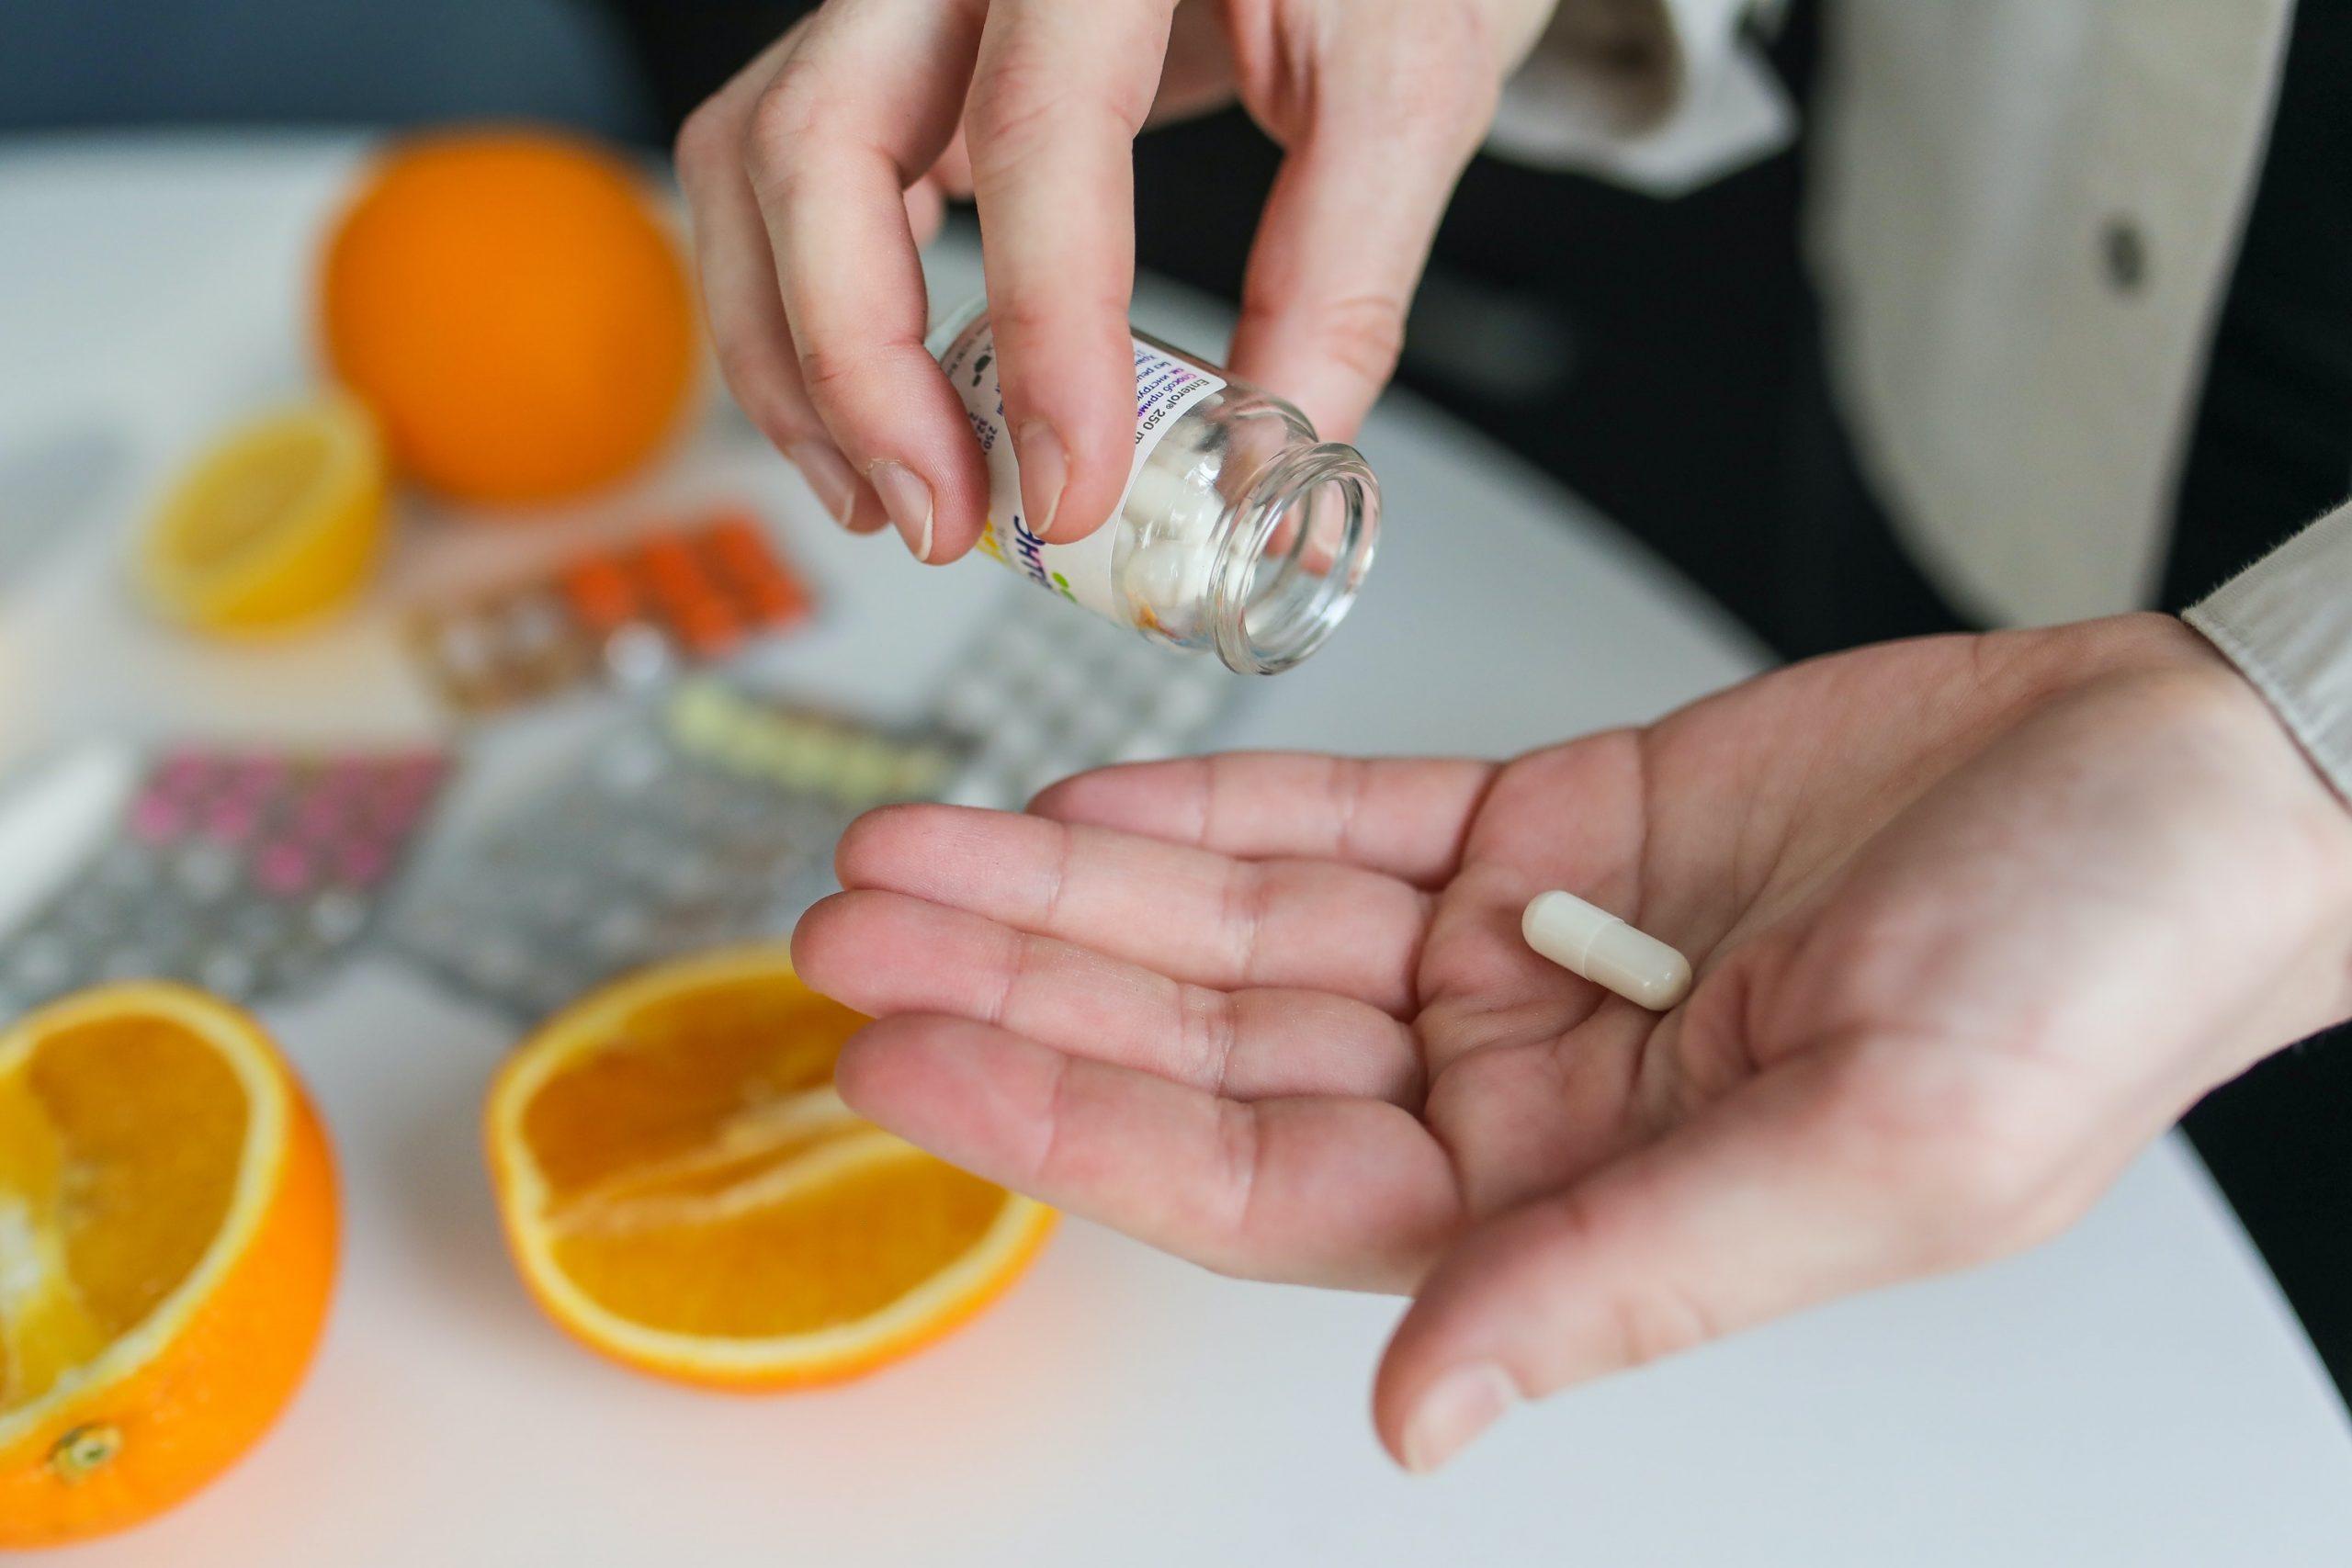 chica pasando pastillas